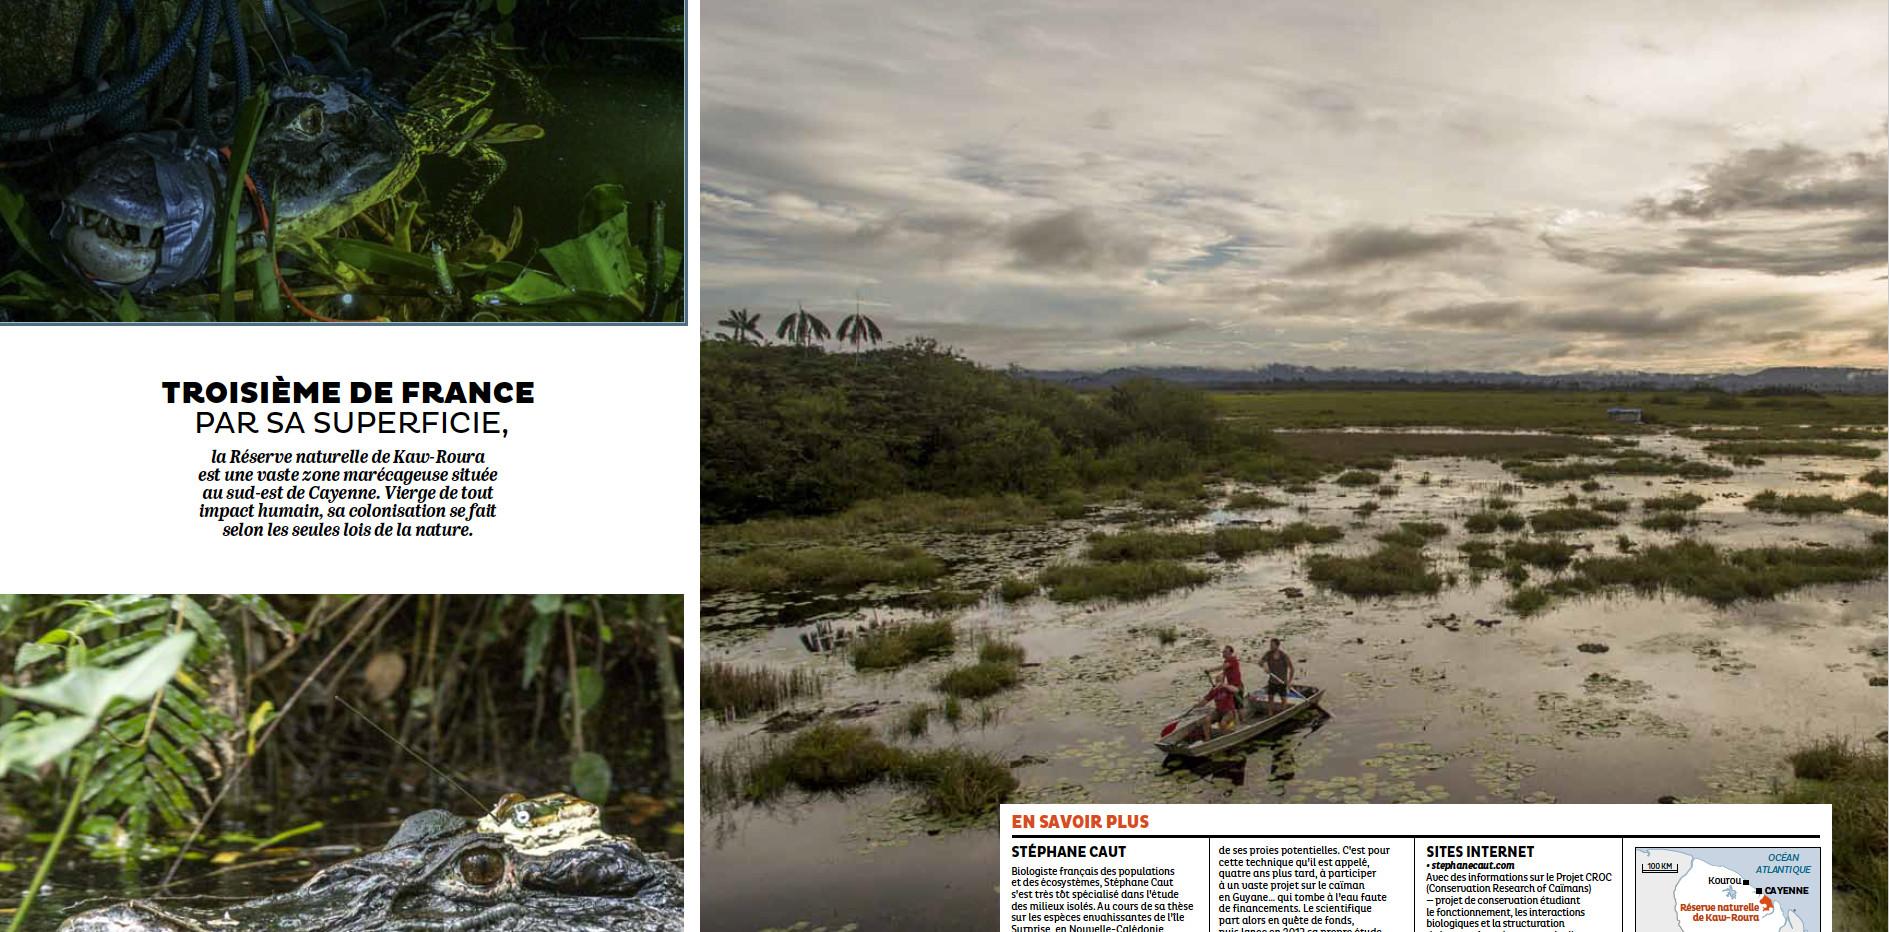 terre sauvage stephane caut page 3